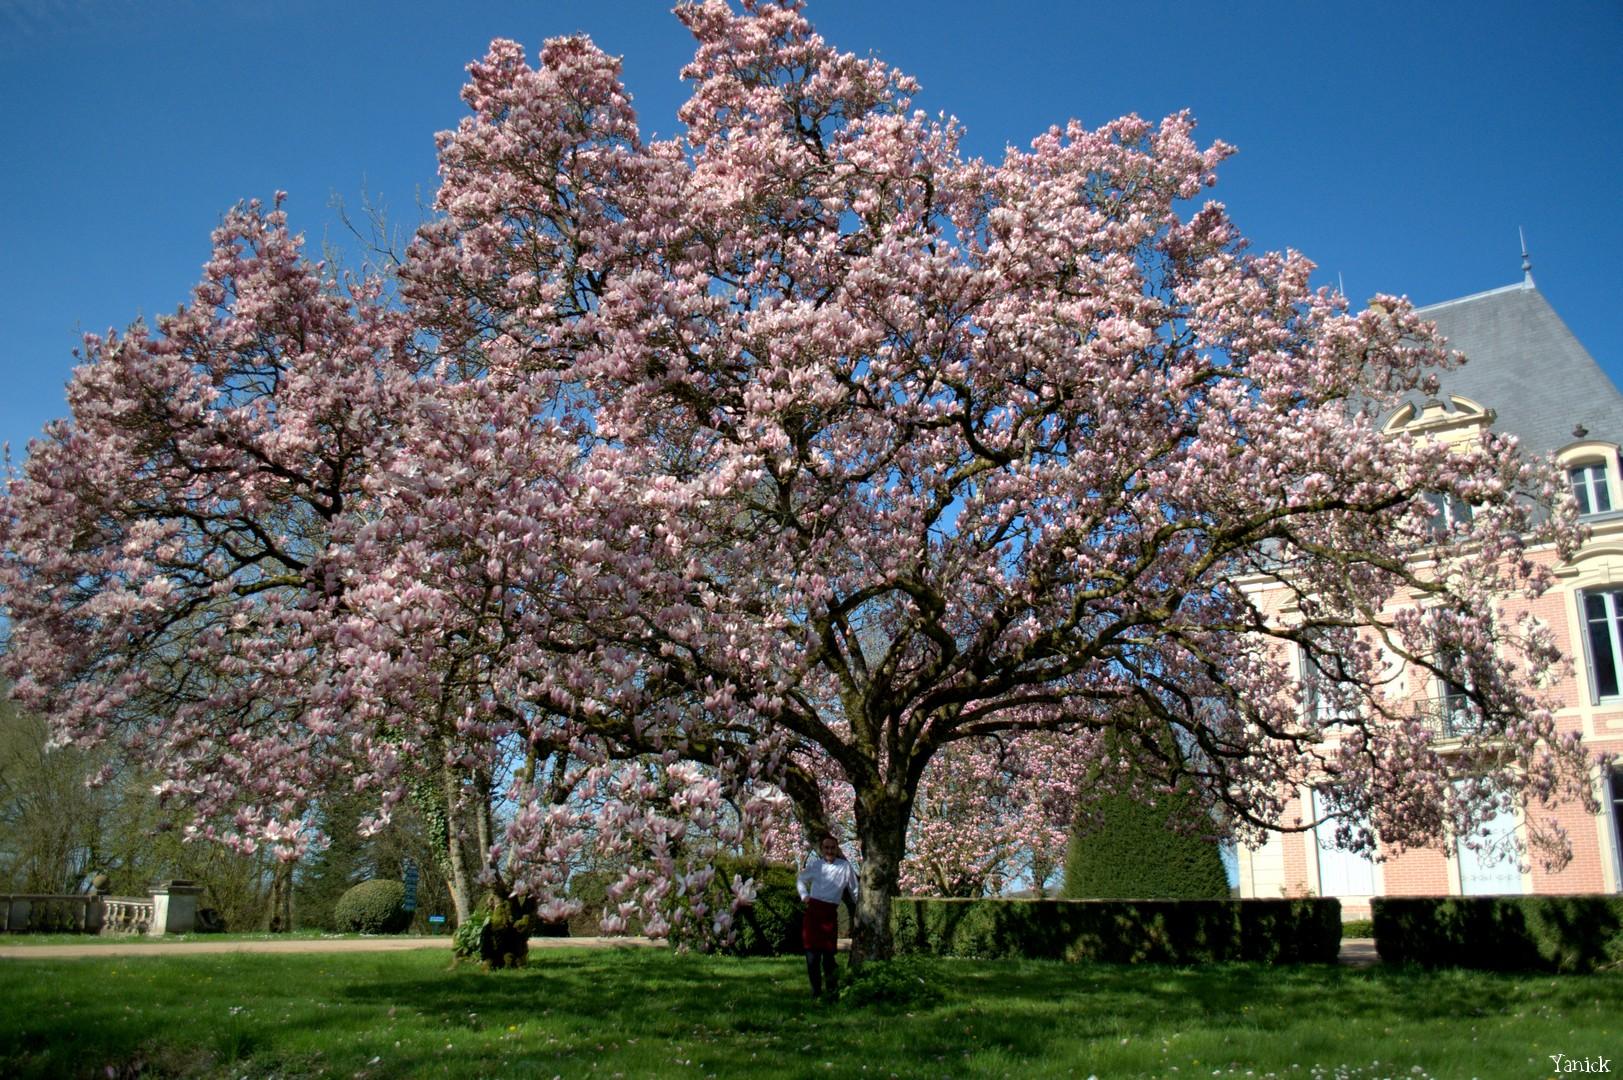 Magnolia - Petit chêne 01 ©Yanick